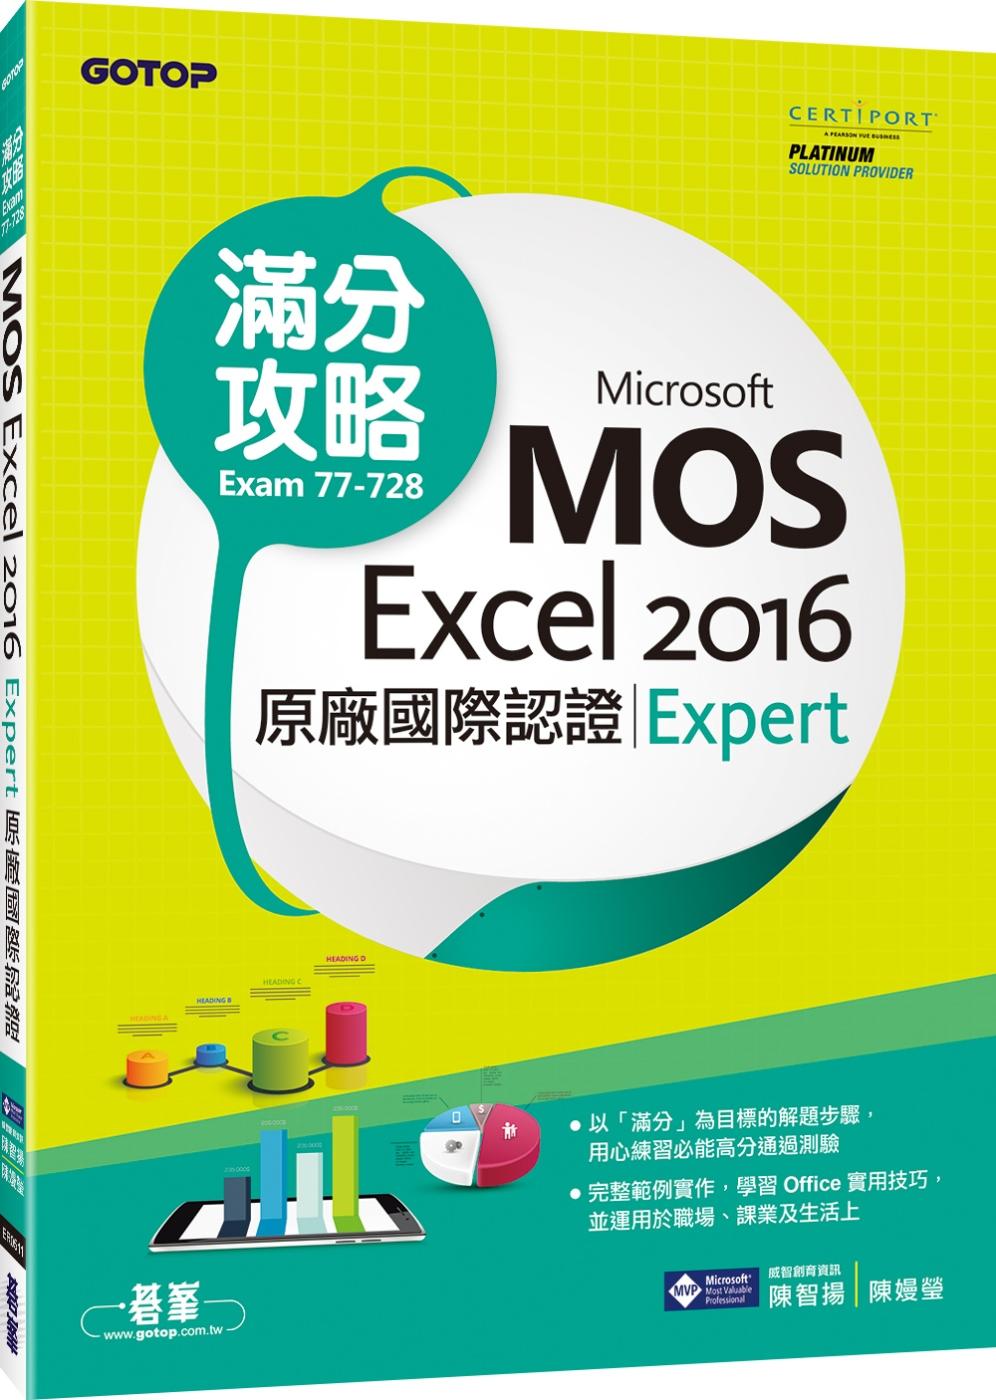 Microsoft MOS Excel 2016 Expert 原廠國際認證滿分攻略 (Exam 77-728)